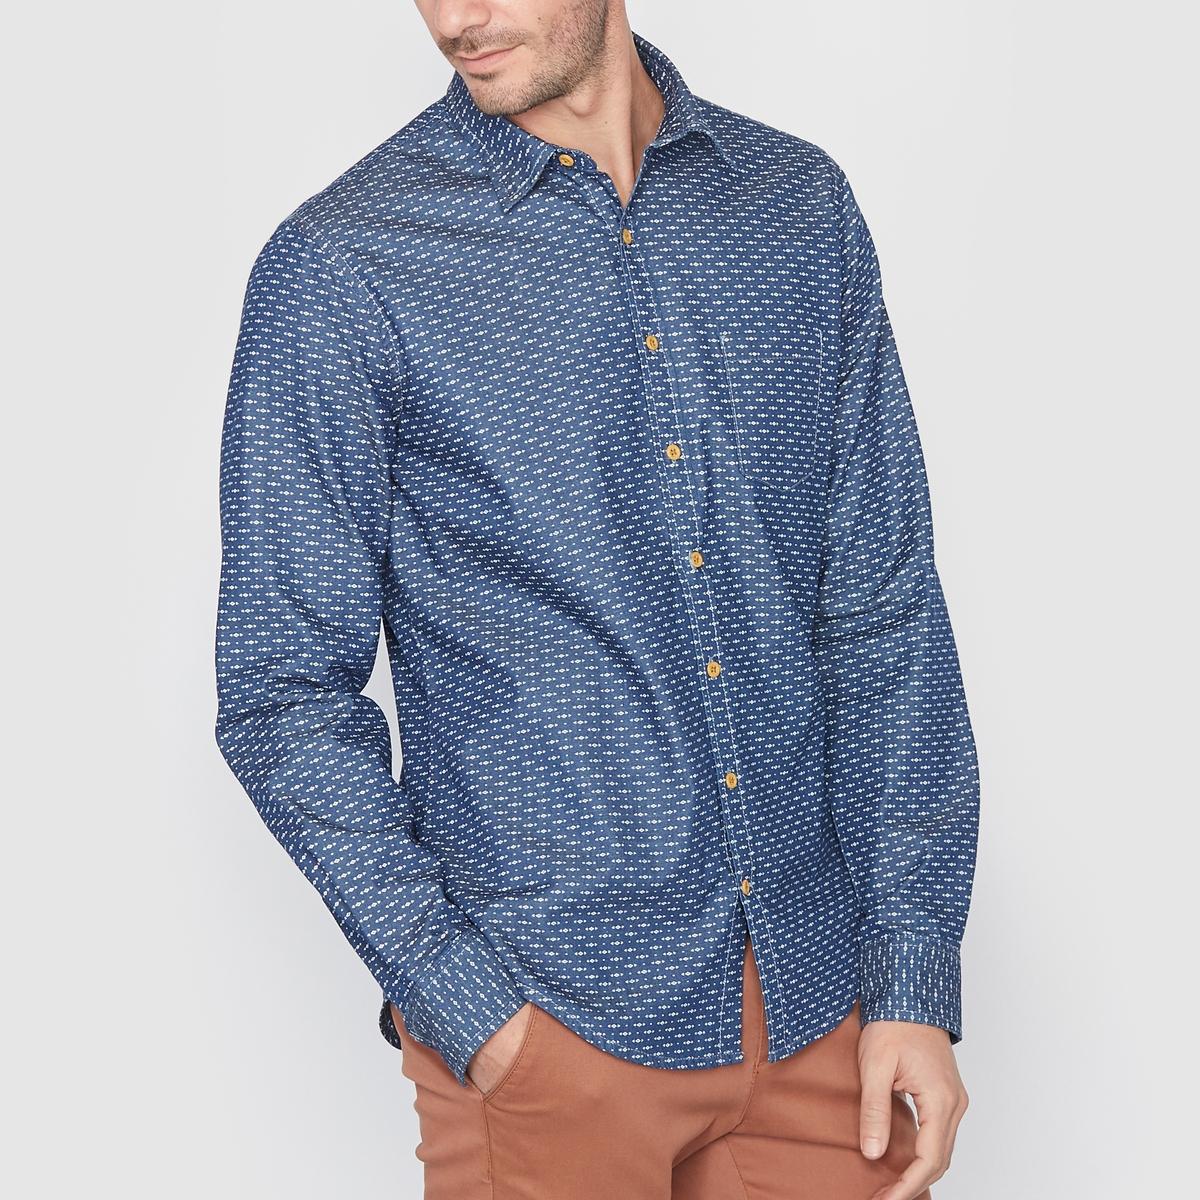 Рубашка джинсовая стандартного покроя с рисунком от La Redoute